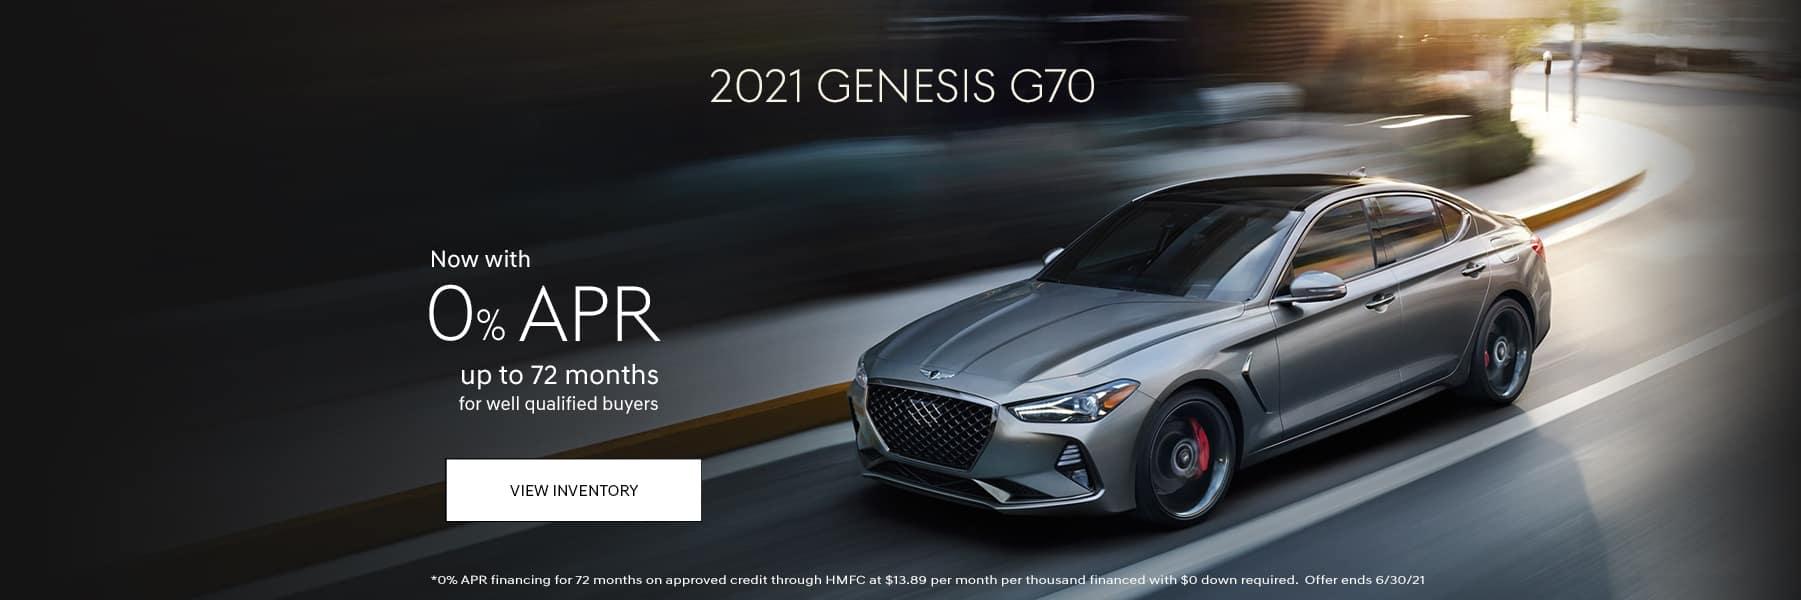 2021-Genesis-G70-Jun21